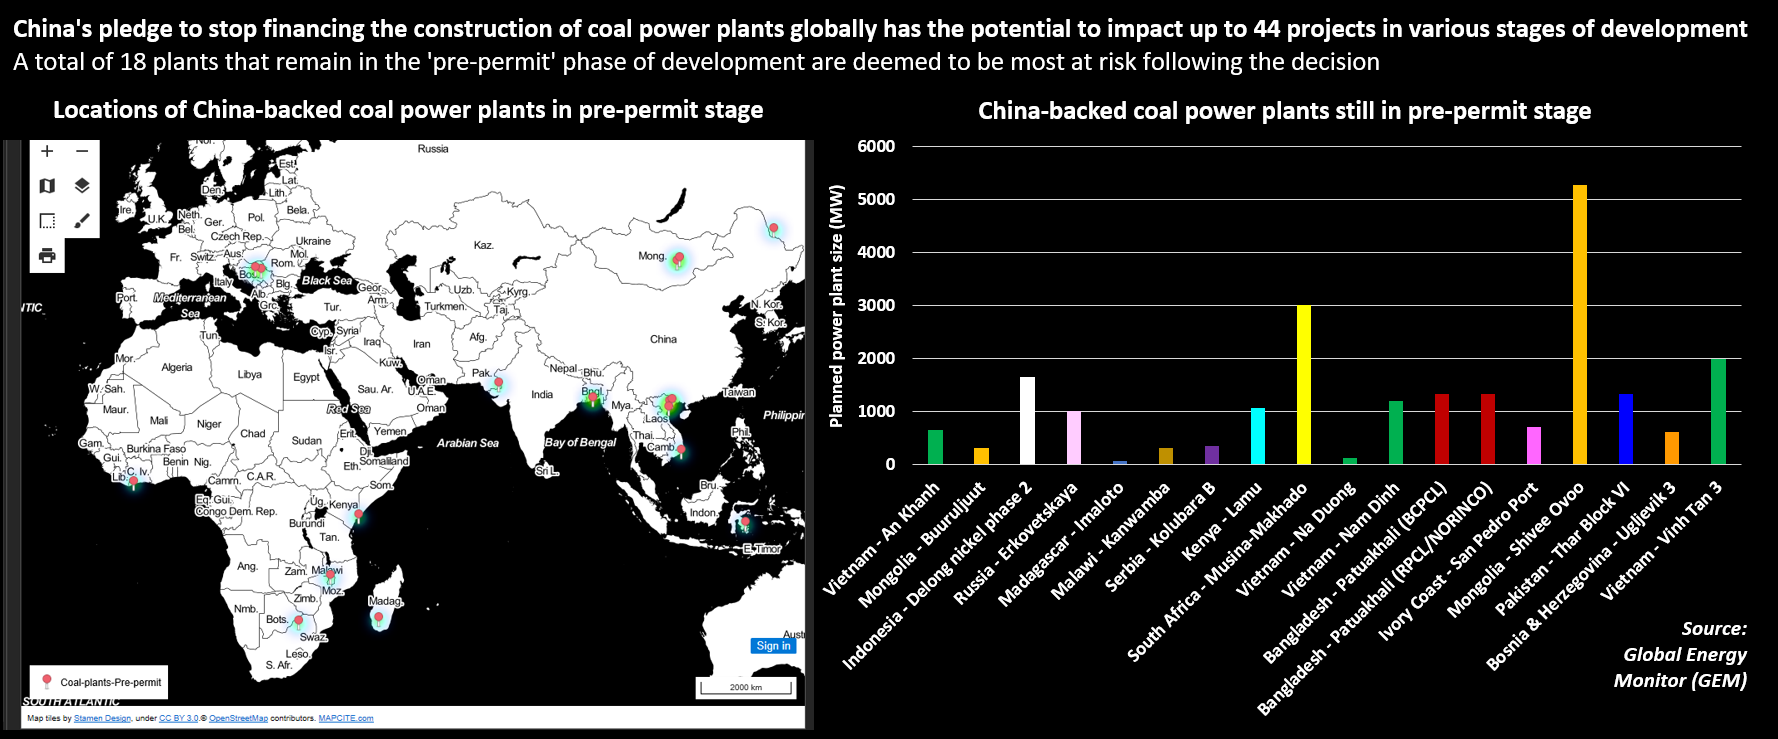 China-backed coal power plants